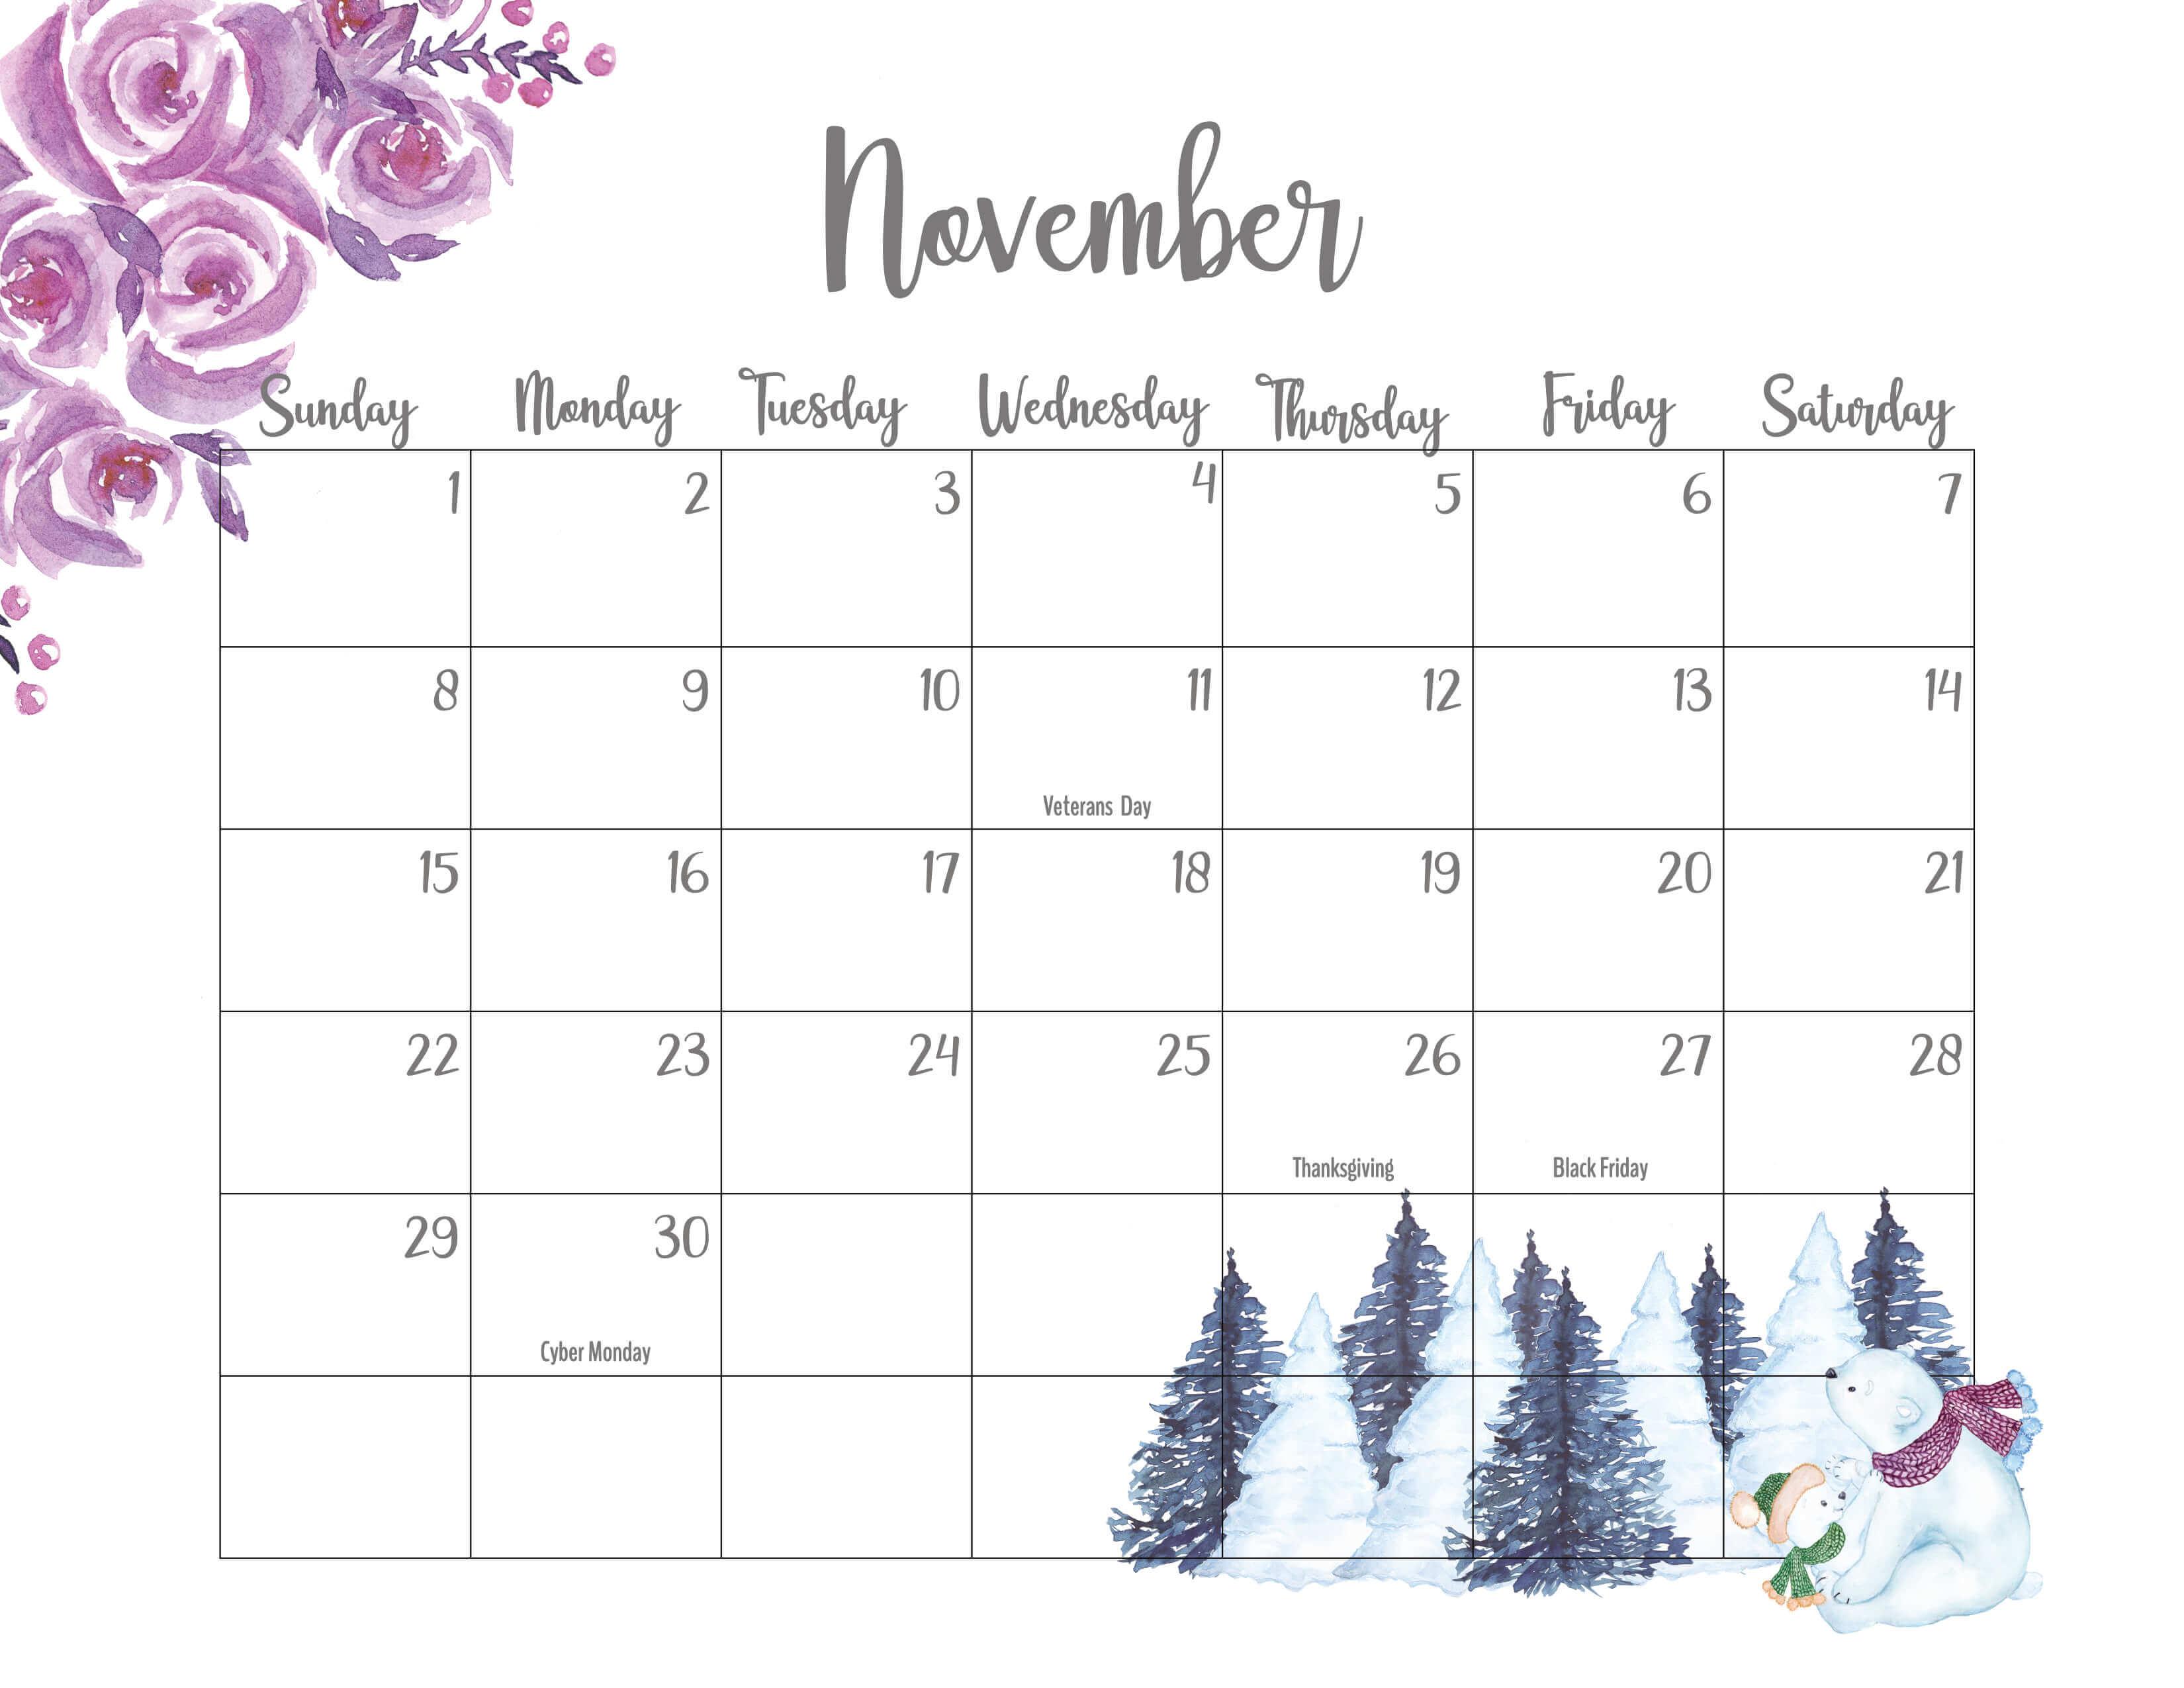 Floral November 2020 Calendar Template